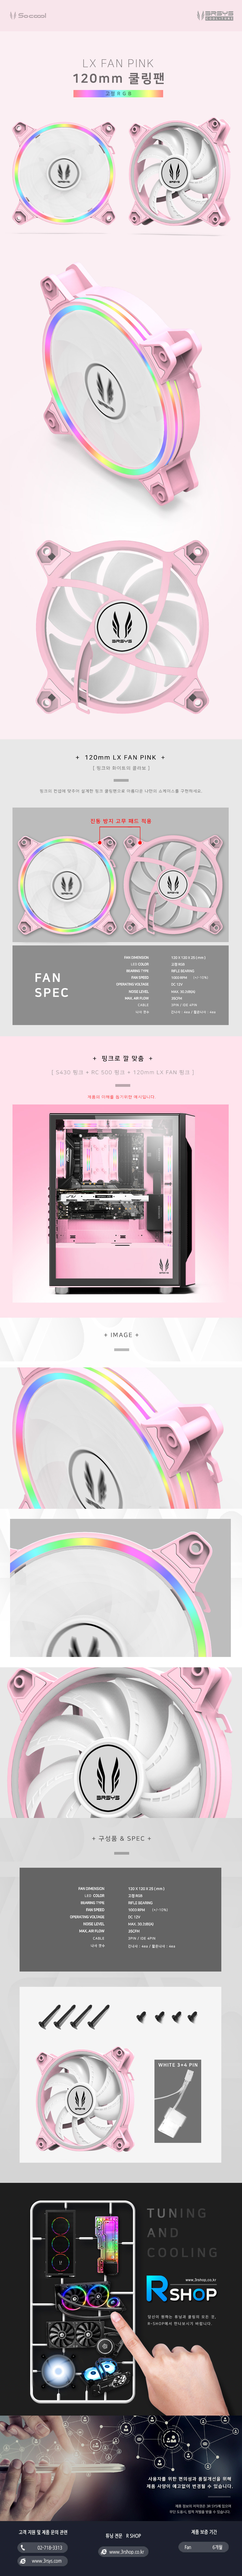 3RSYS LX FAN RGB (PINK)